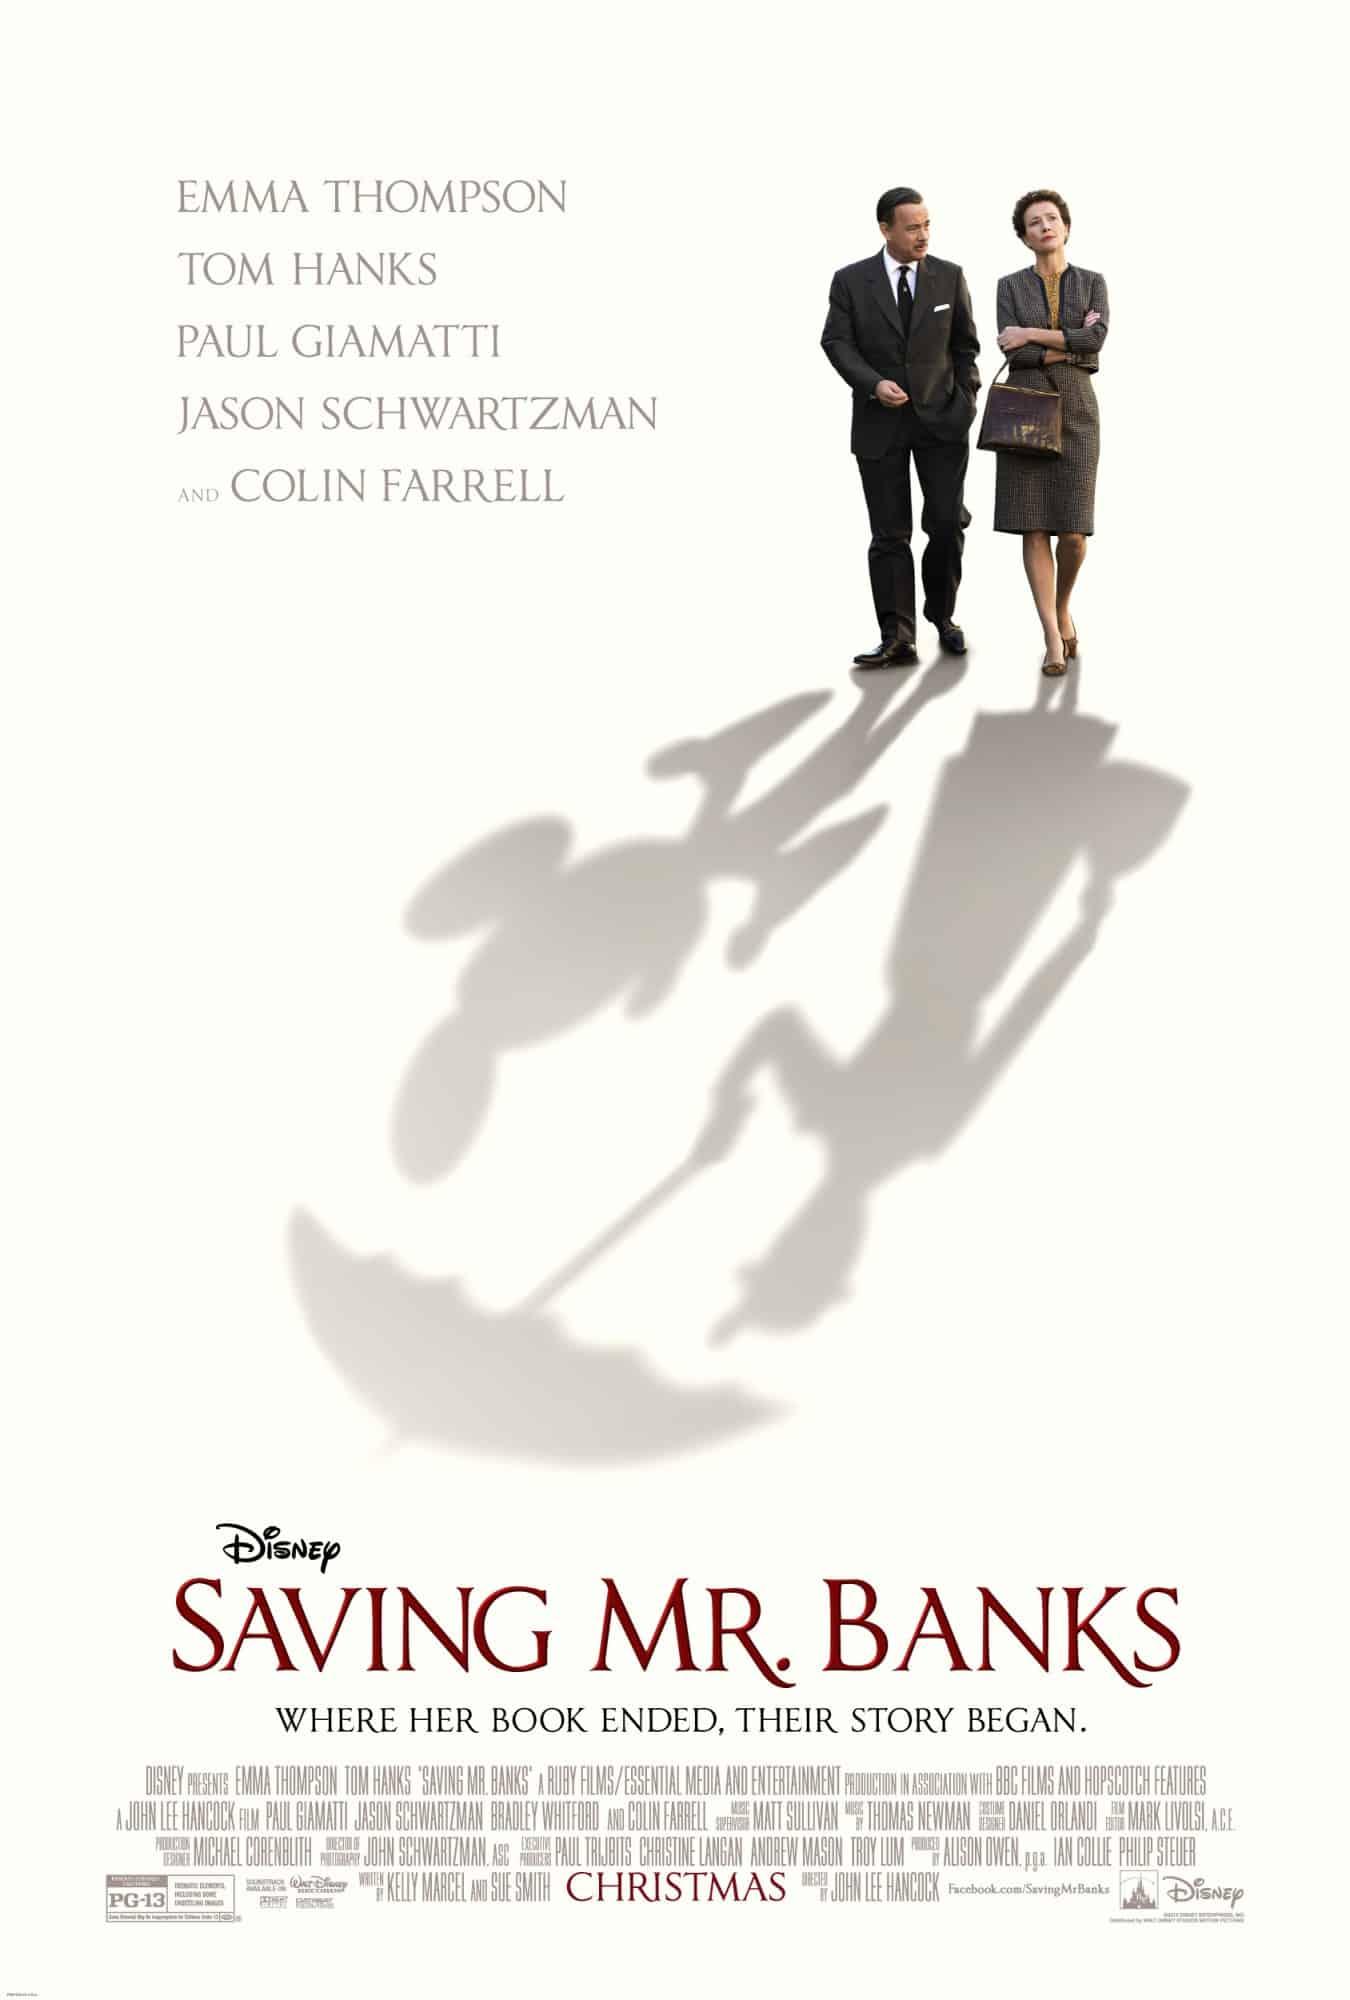 Saving Mr. Banks teaser poster